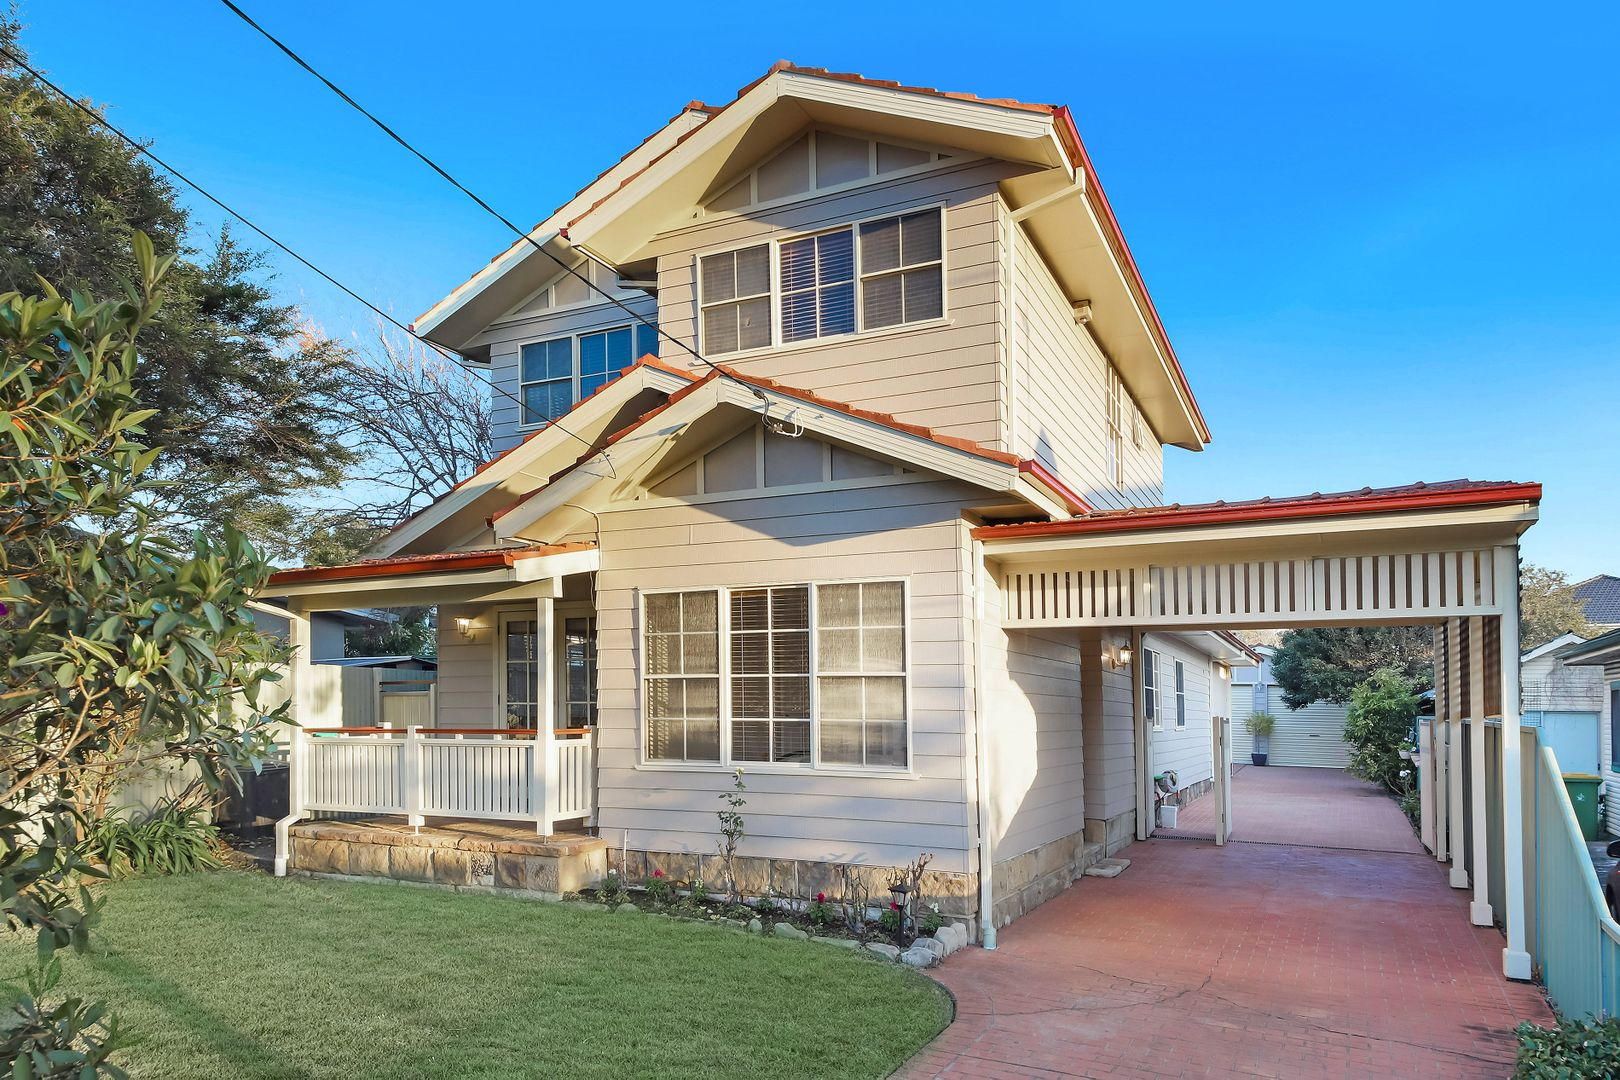 1 Birrong Avenue, Birrong NSW 2143, Image 0